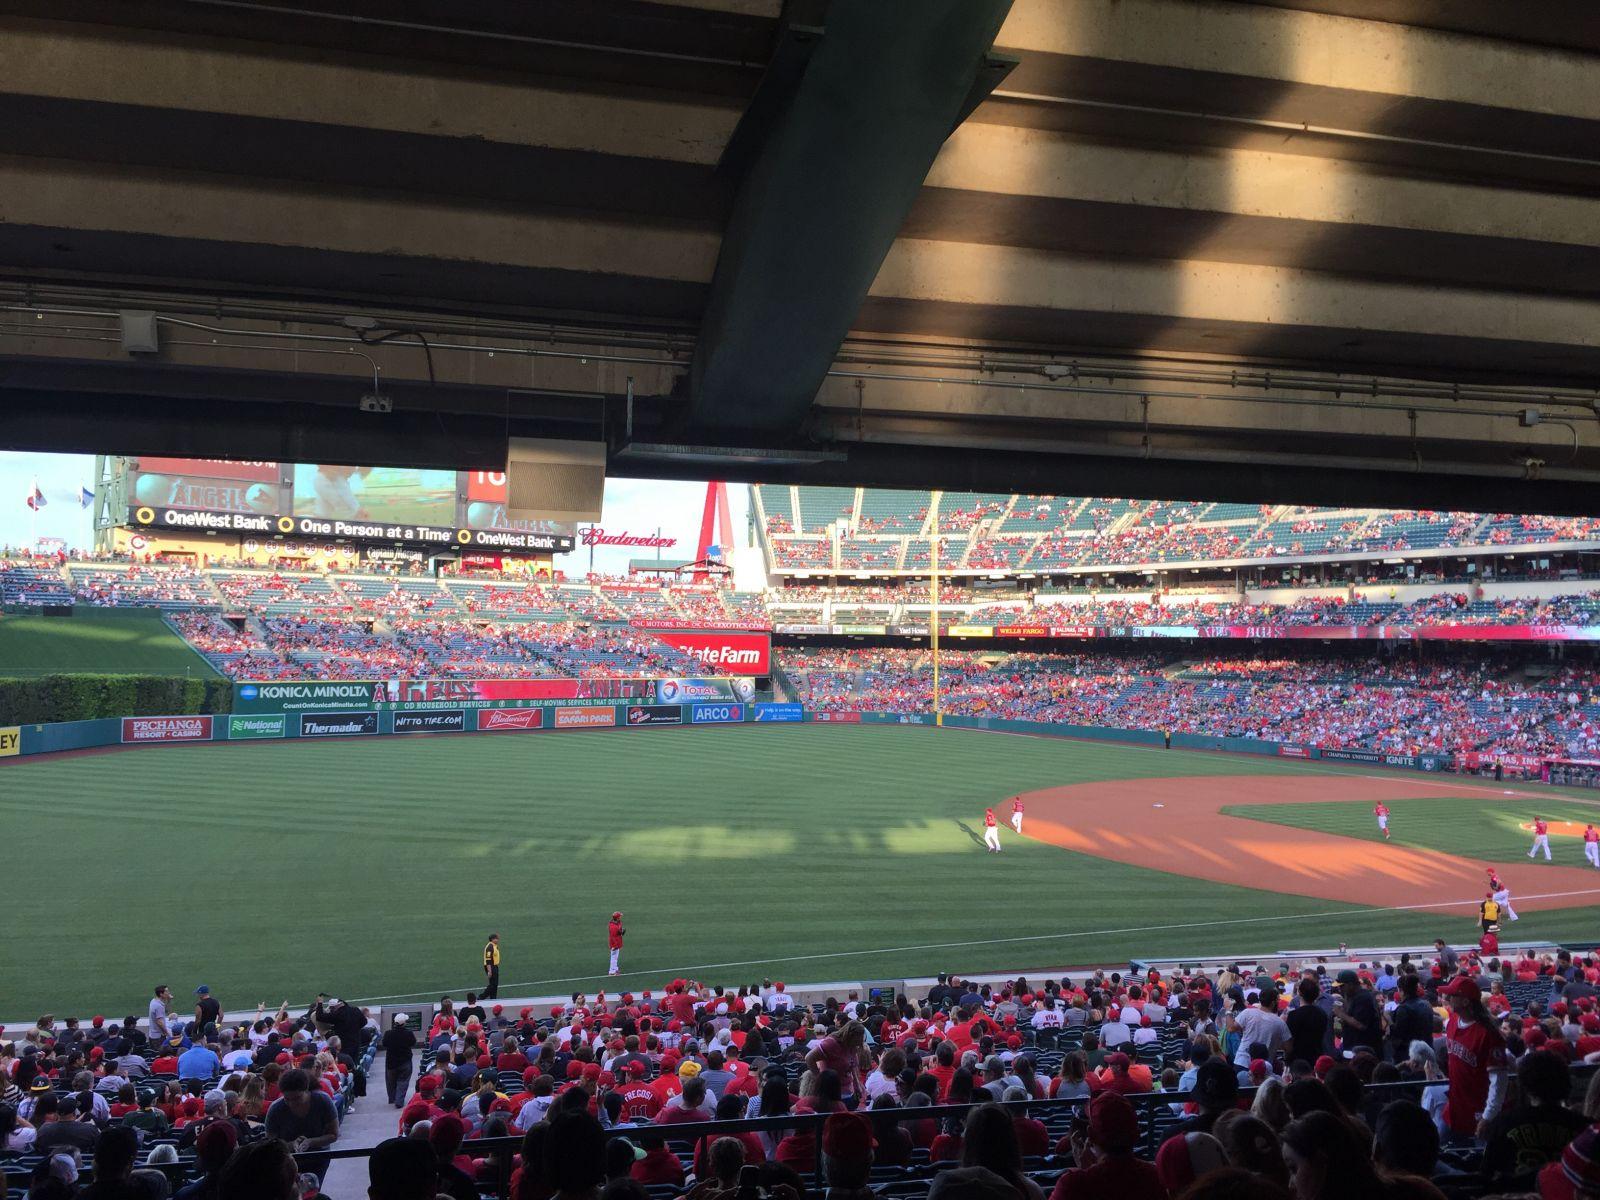 Angel Stadium Section 206 - RateYourSeats.com